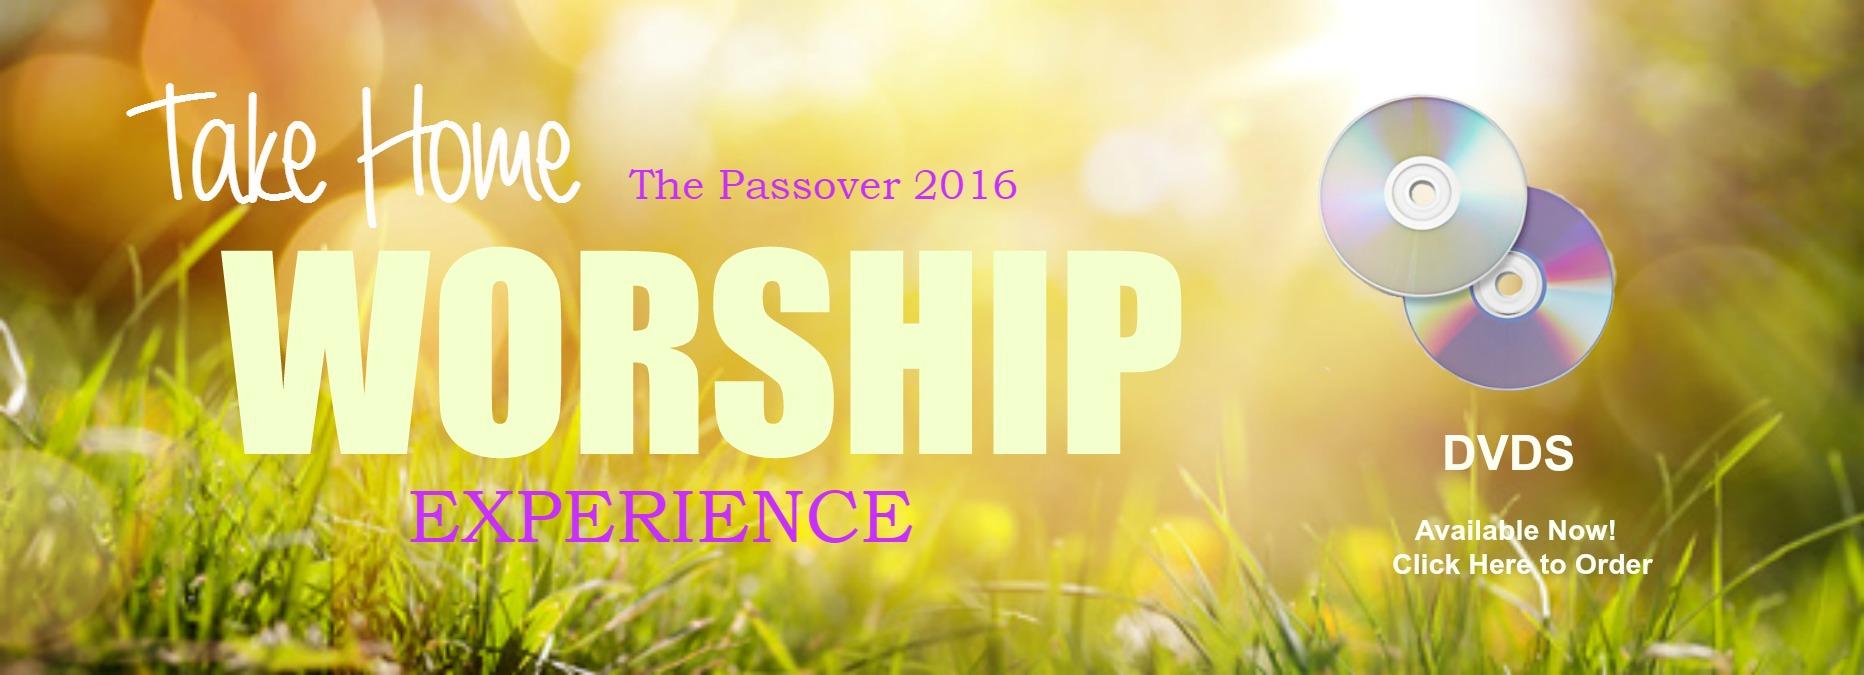 passover-dvd-banner